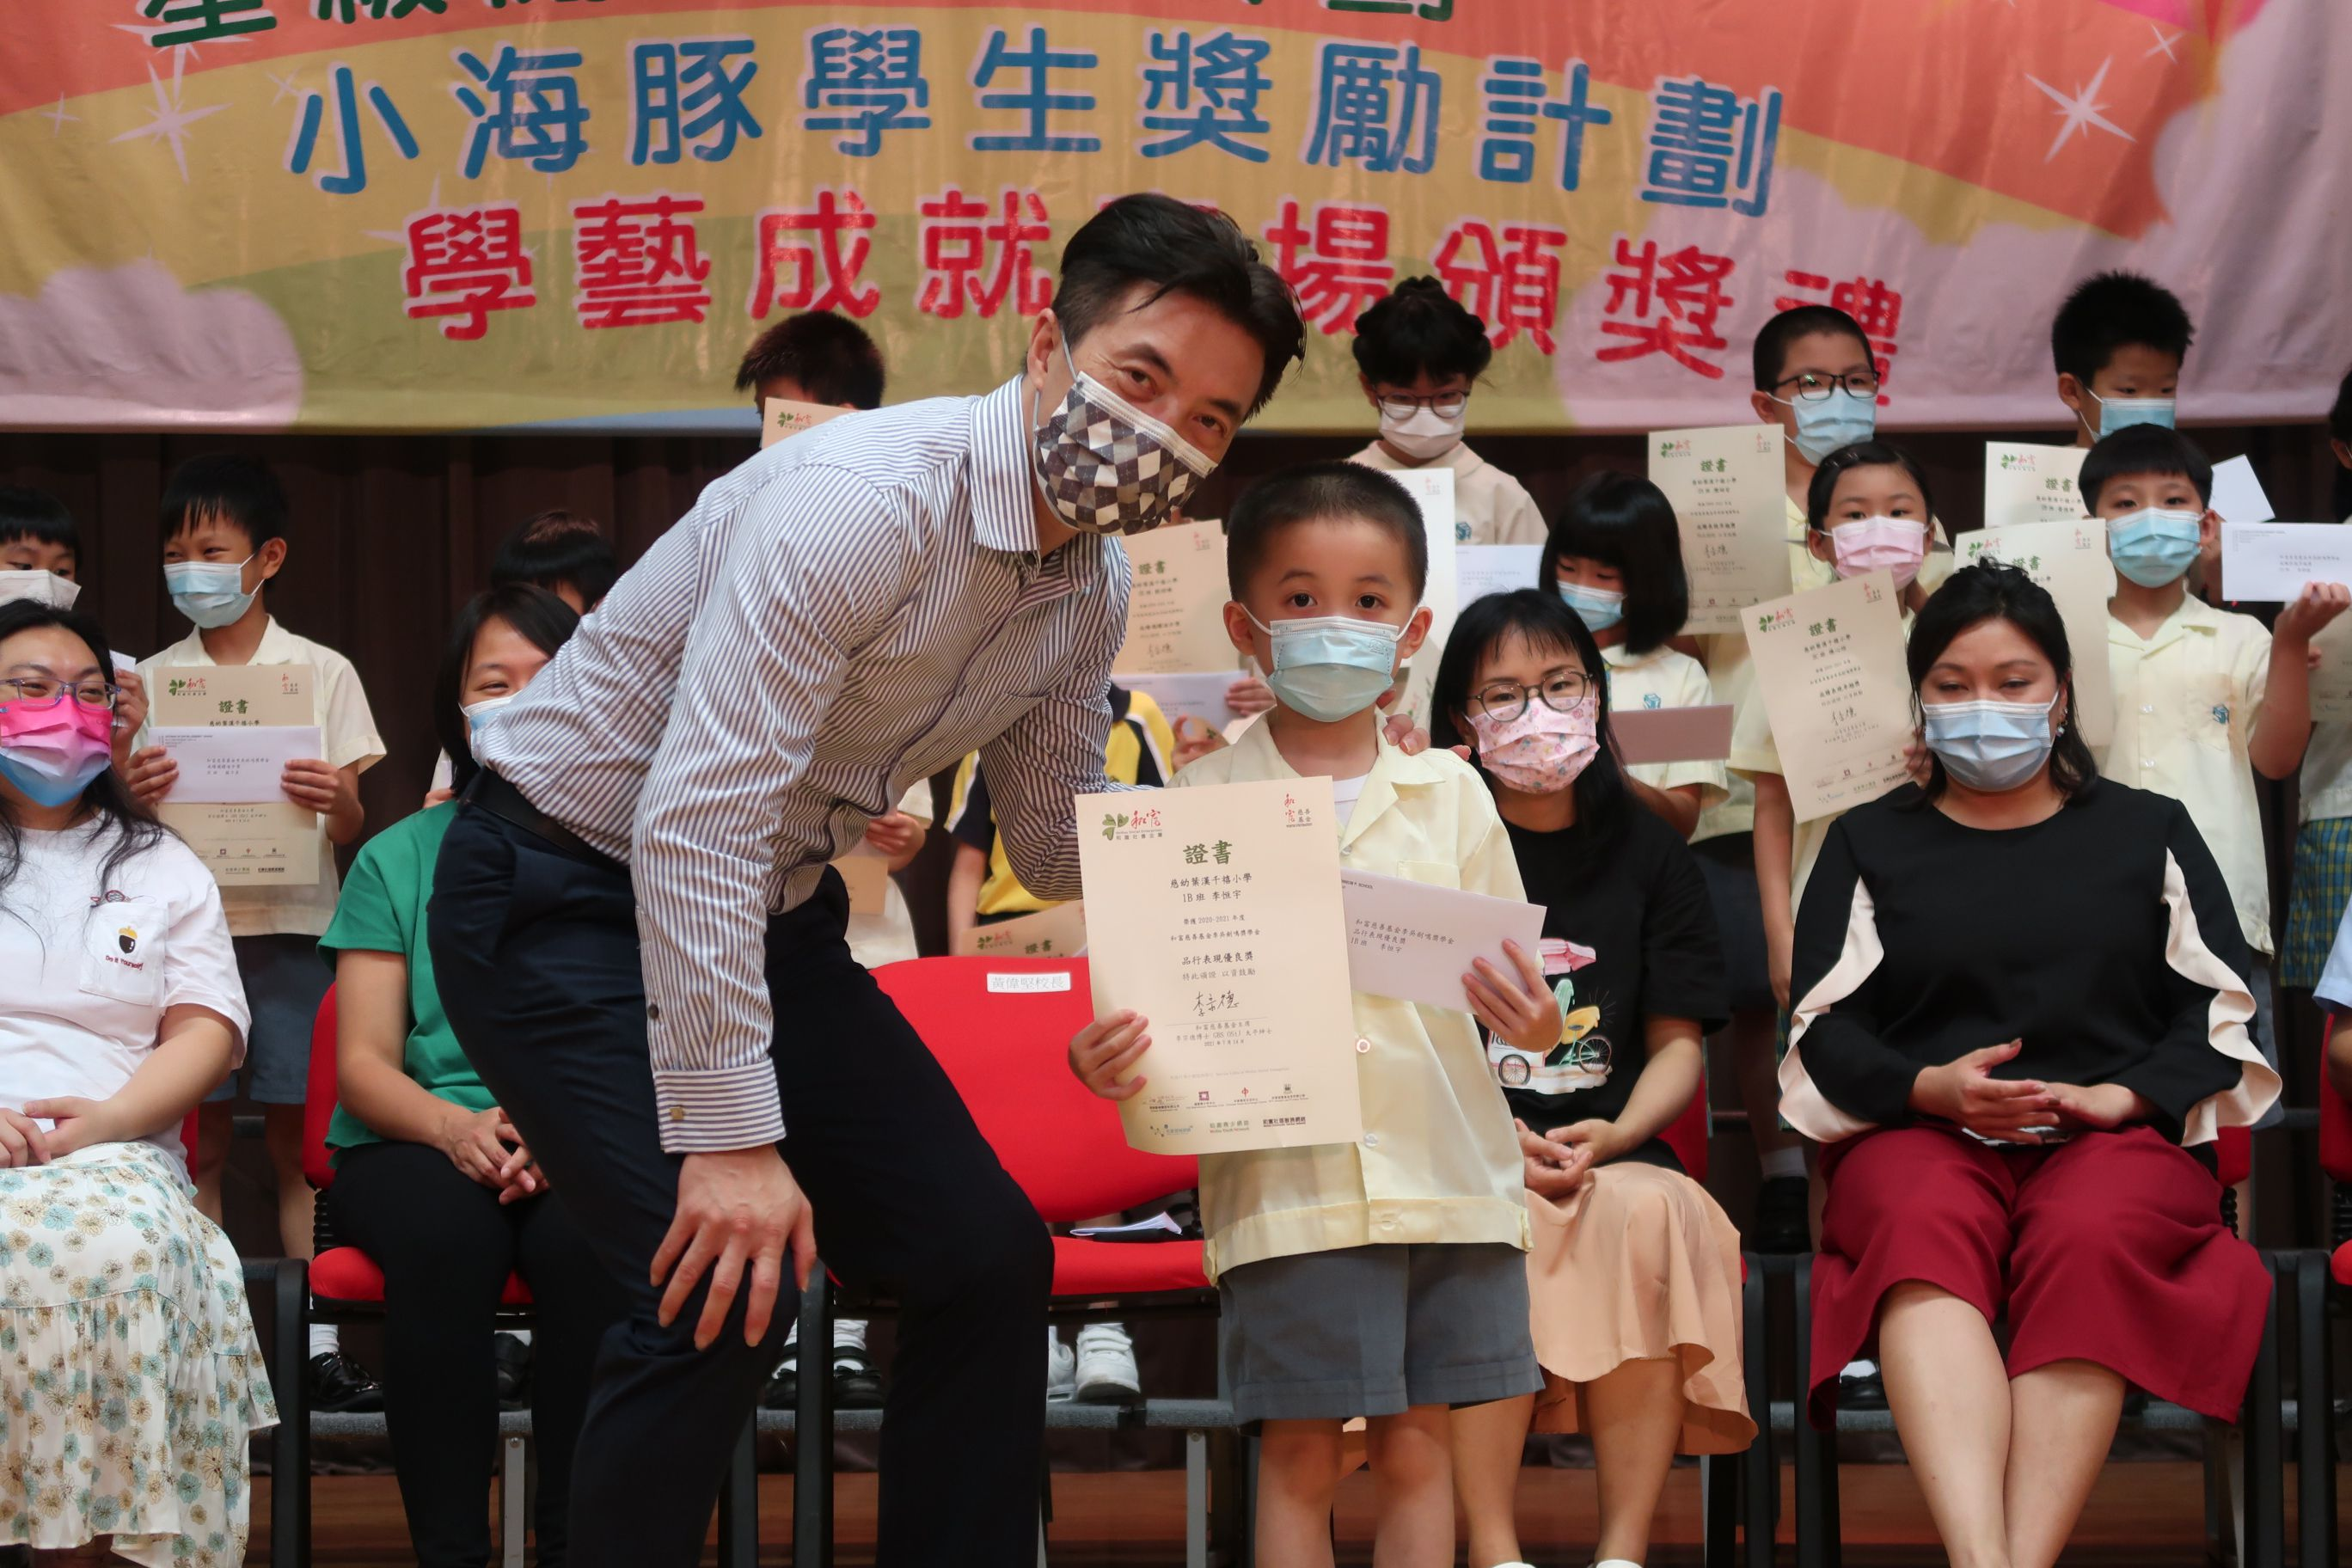 https://syh.edu.hk/sites/default/files/img_5949_1.jpg